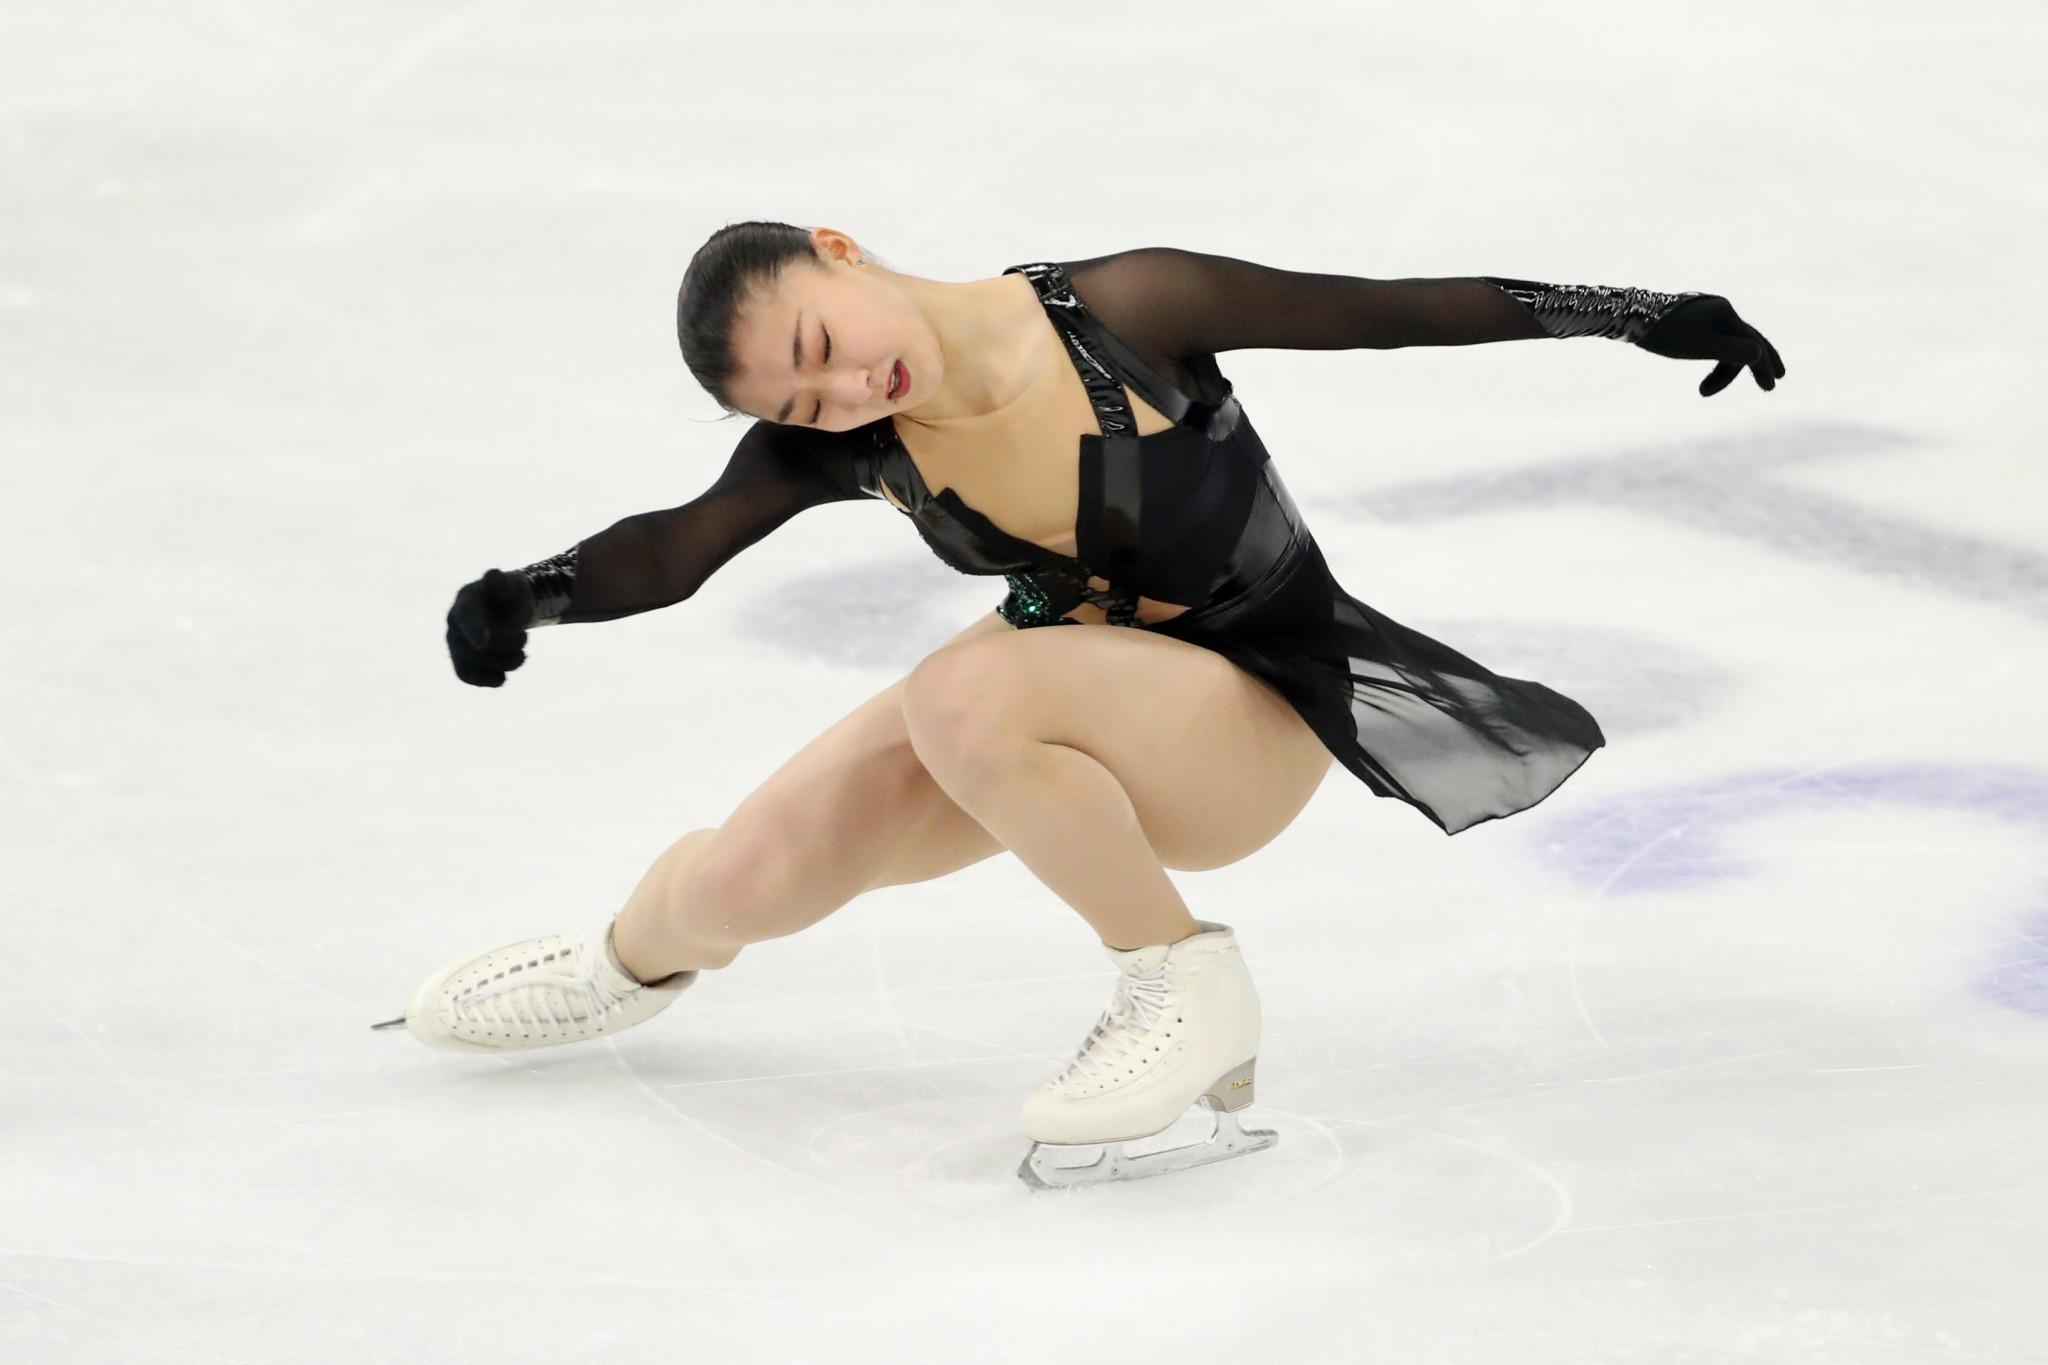 Kaori Sakamoto impressed in the women's short programme at the Capital Indoor Stadium in Beijing ©Getty Images